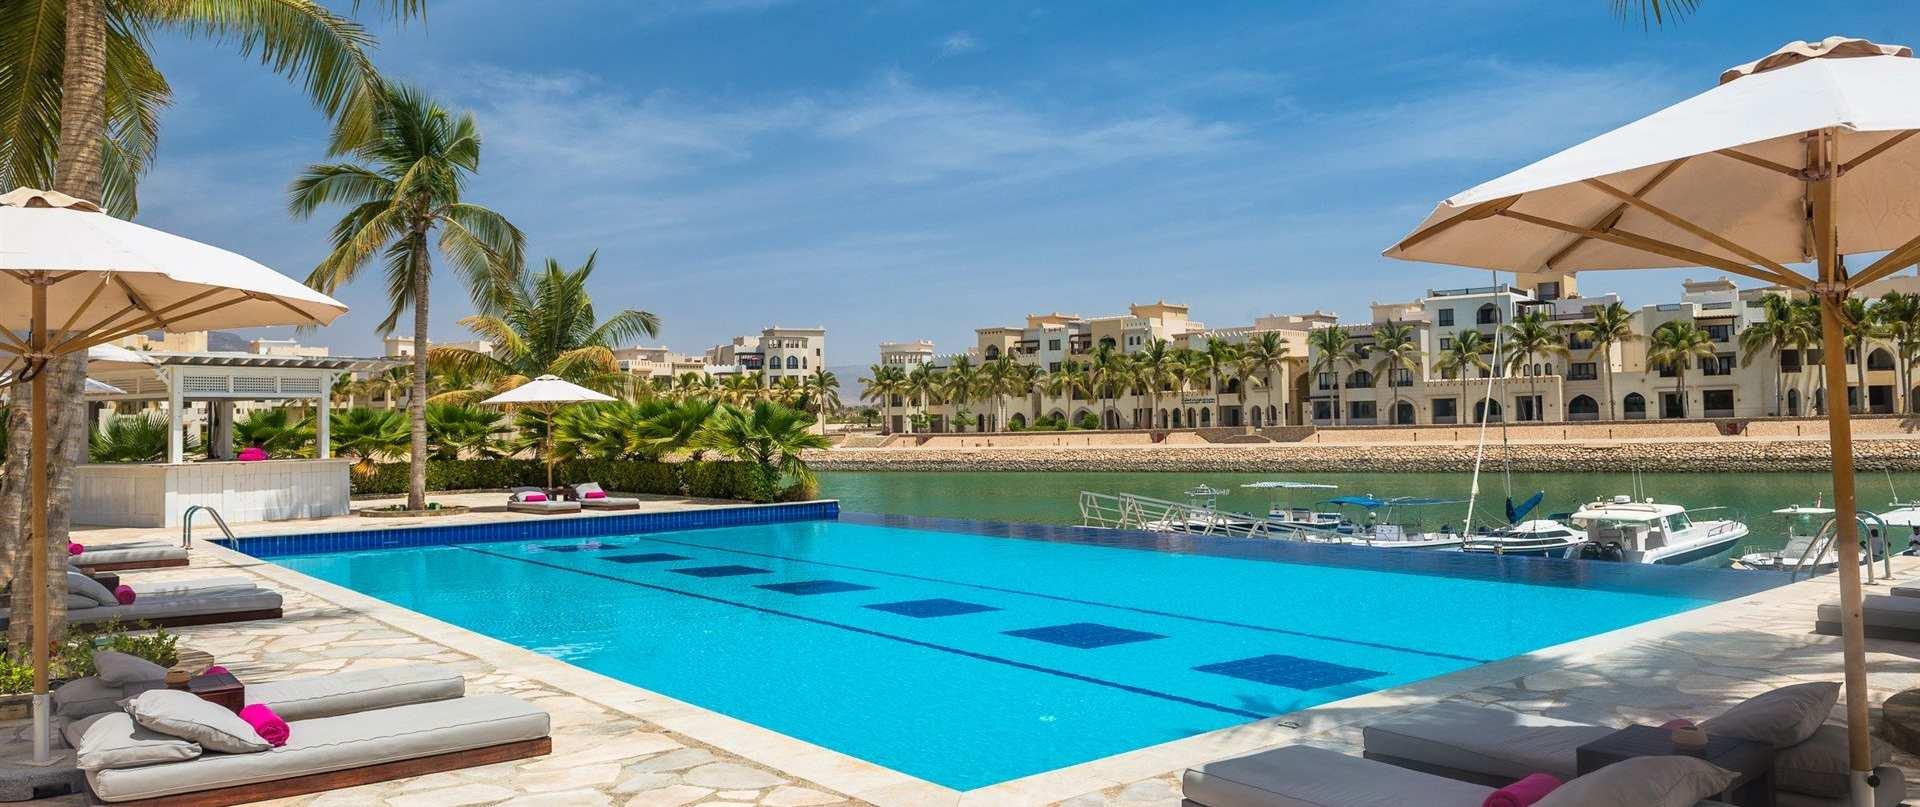 juweira_hotel_salalah_pool_marina.jpg.1920x807_0_297_10000